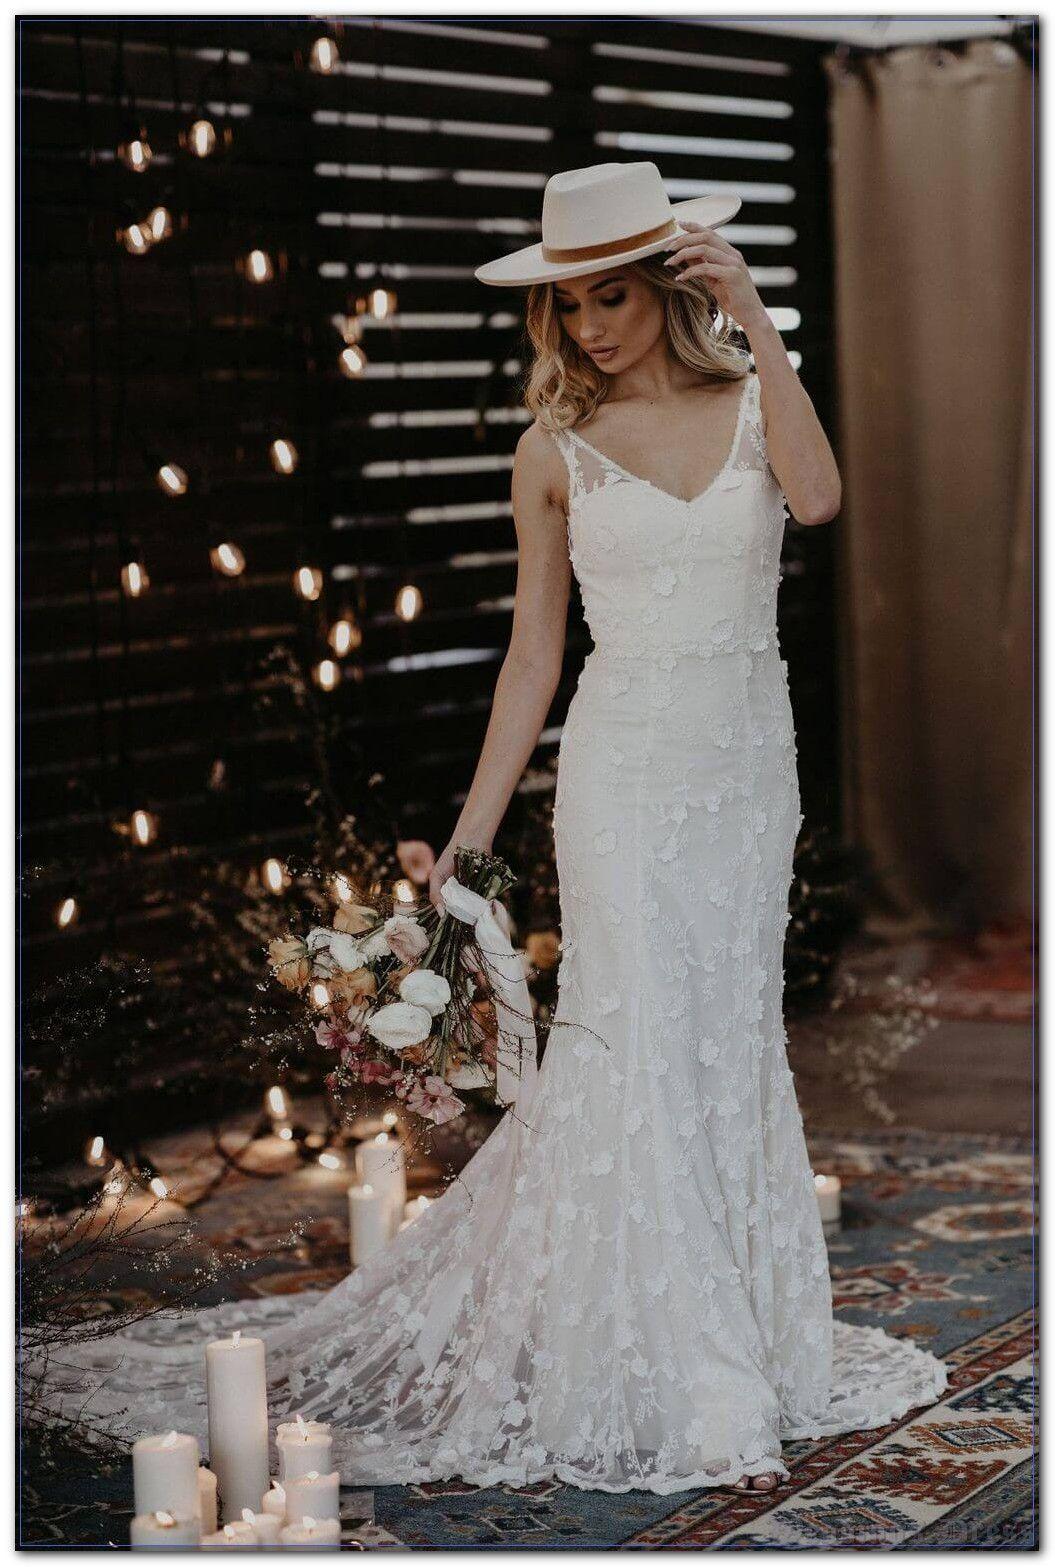 101 Ideas For Weddings Dress